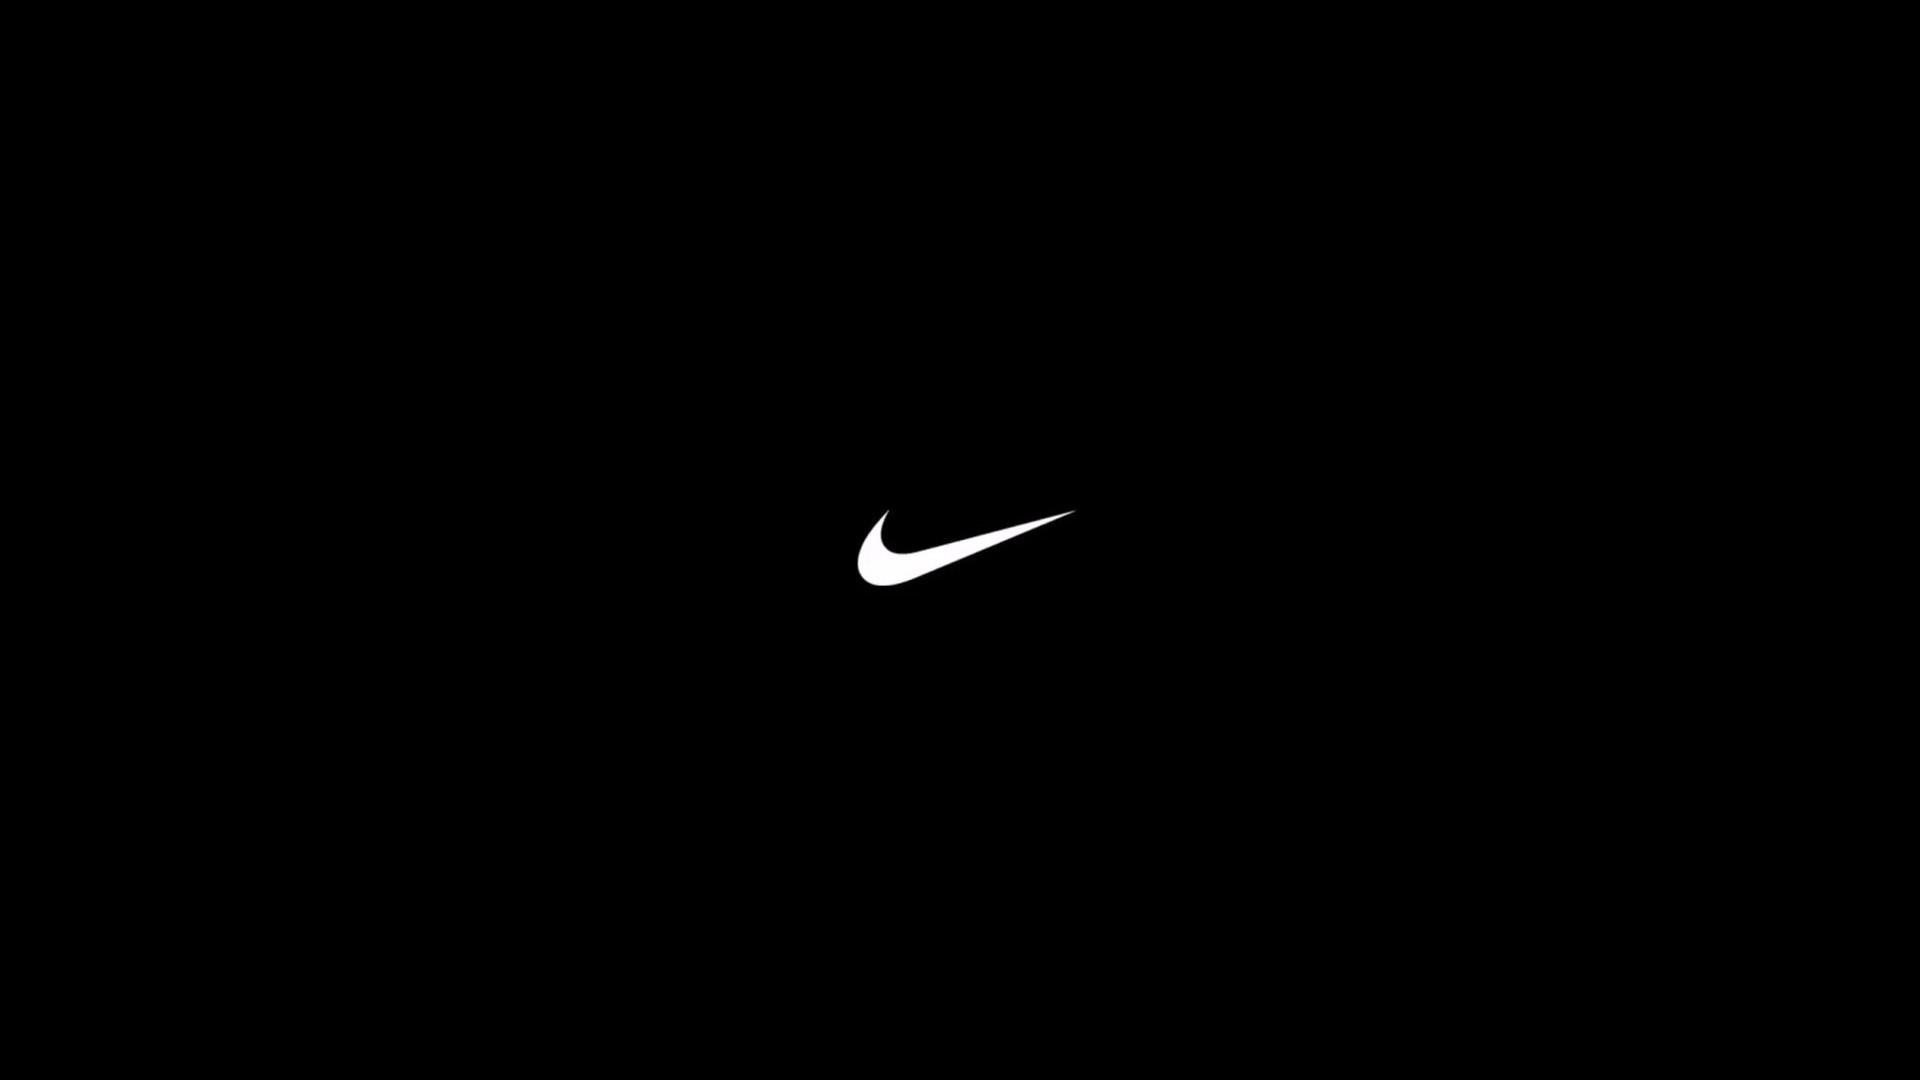 Res: 1920x1080, Nike logo wallpaper